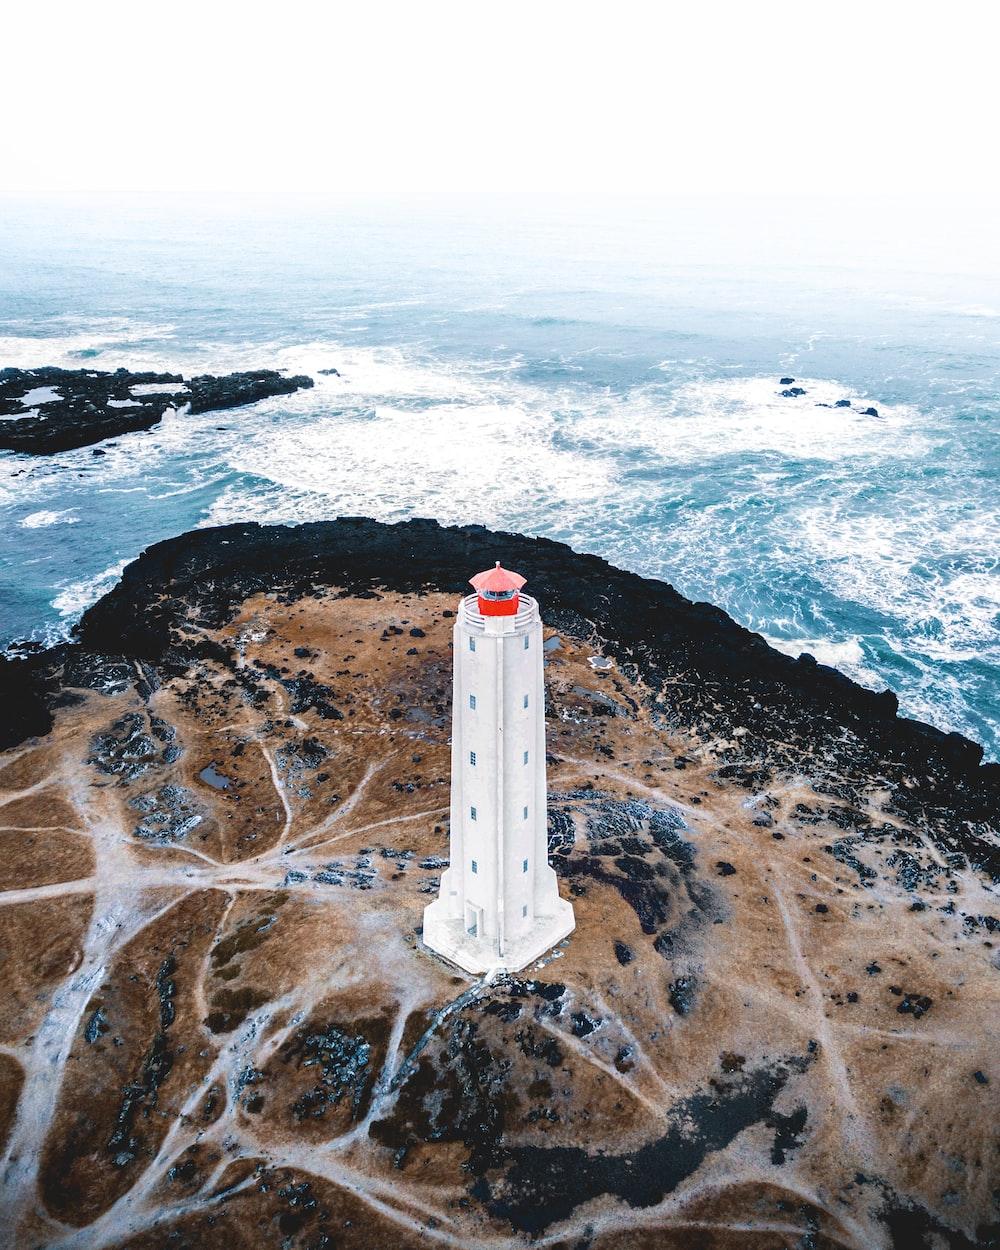 bird's eye photography of white lighthouse tower near ocean